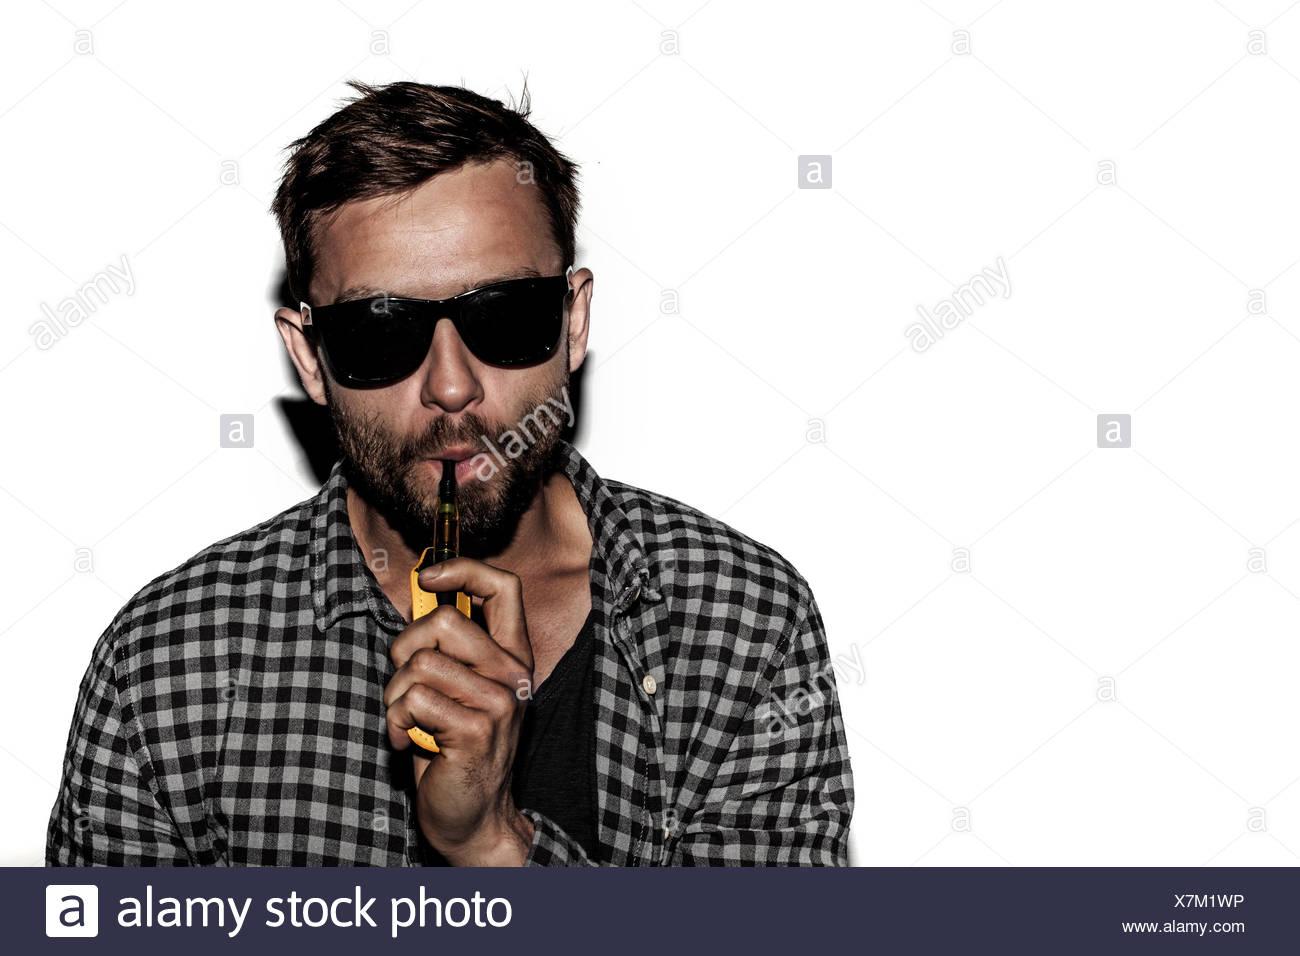 man smoking e-cigarette wearing sunglasses - Stock Image